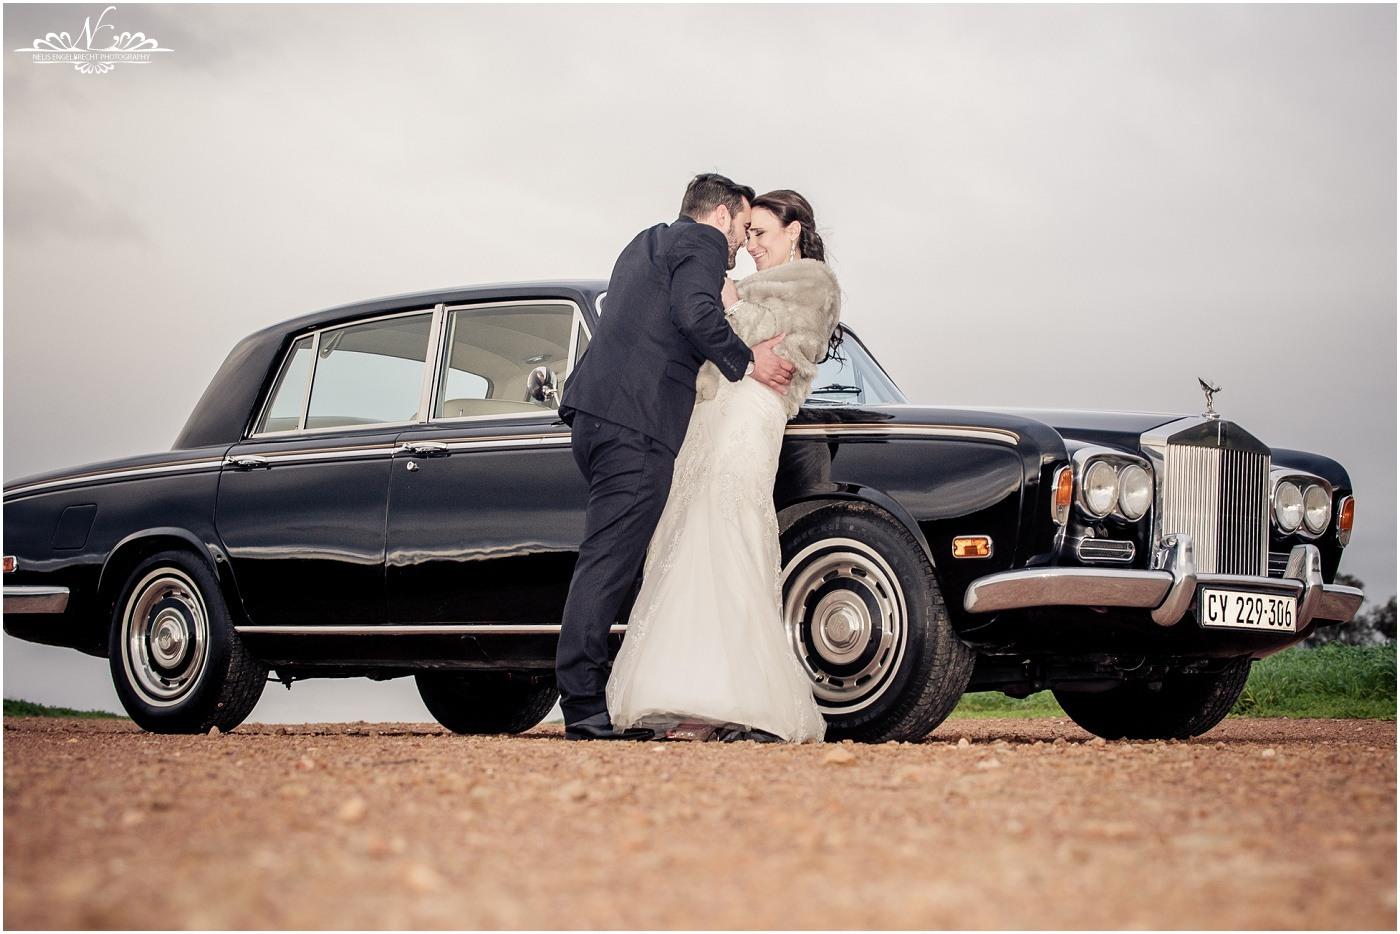 Eensgezind-Wedding-Photos-Nelis-Engelbrecht-Photography-113